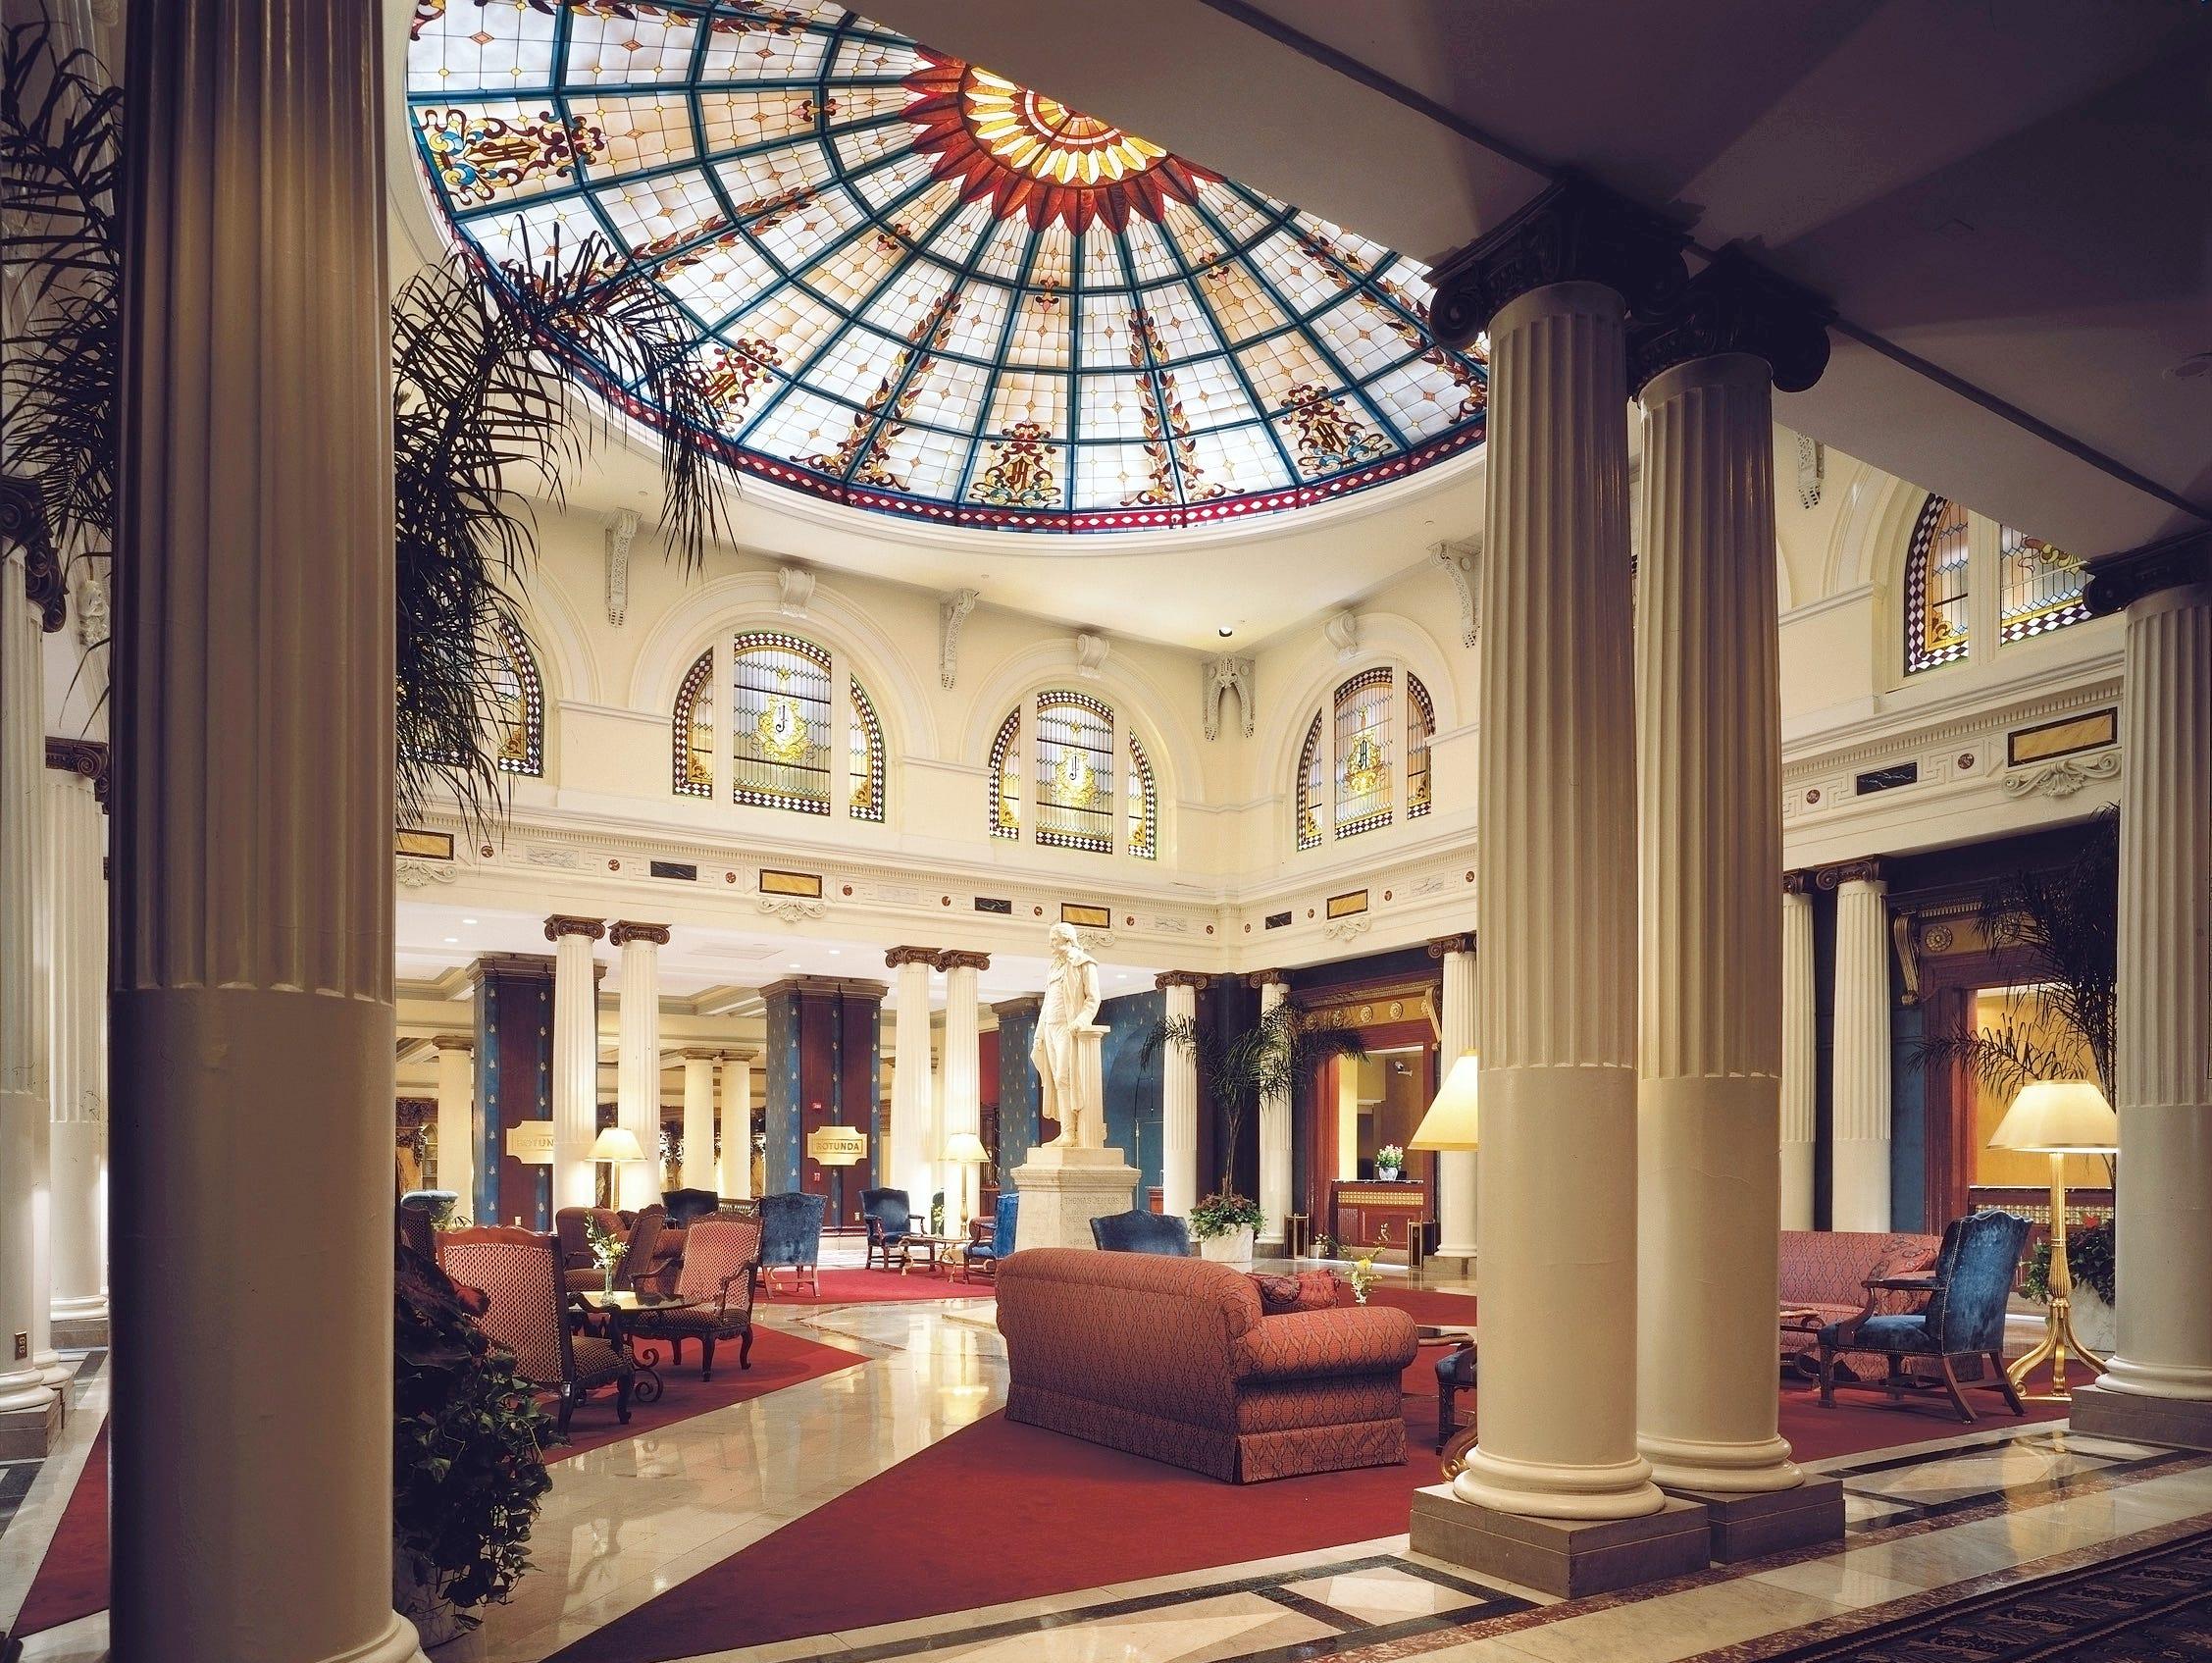 The Jefferson Hotel in Richmond, Va., incorporates touches of Jeffersonian design into the sitting area.